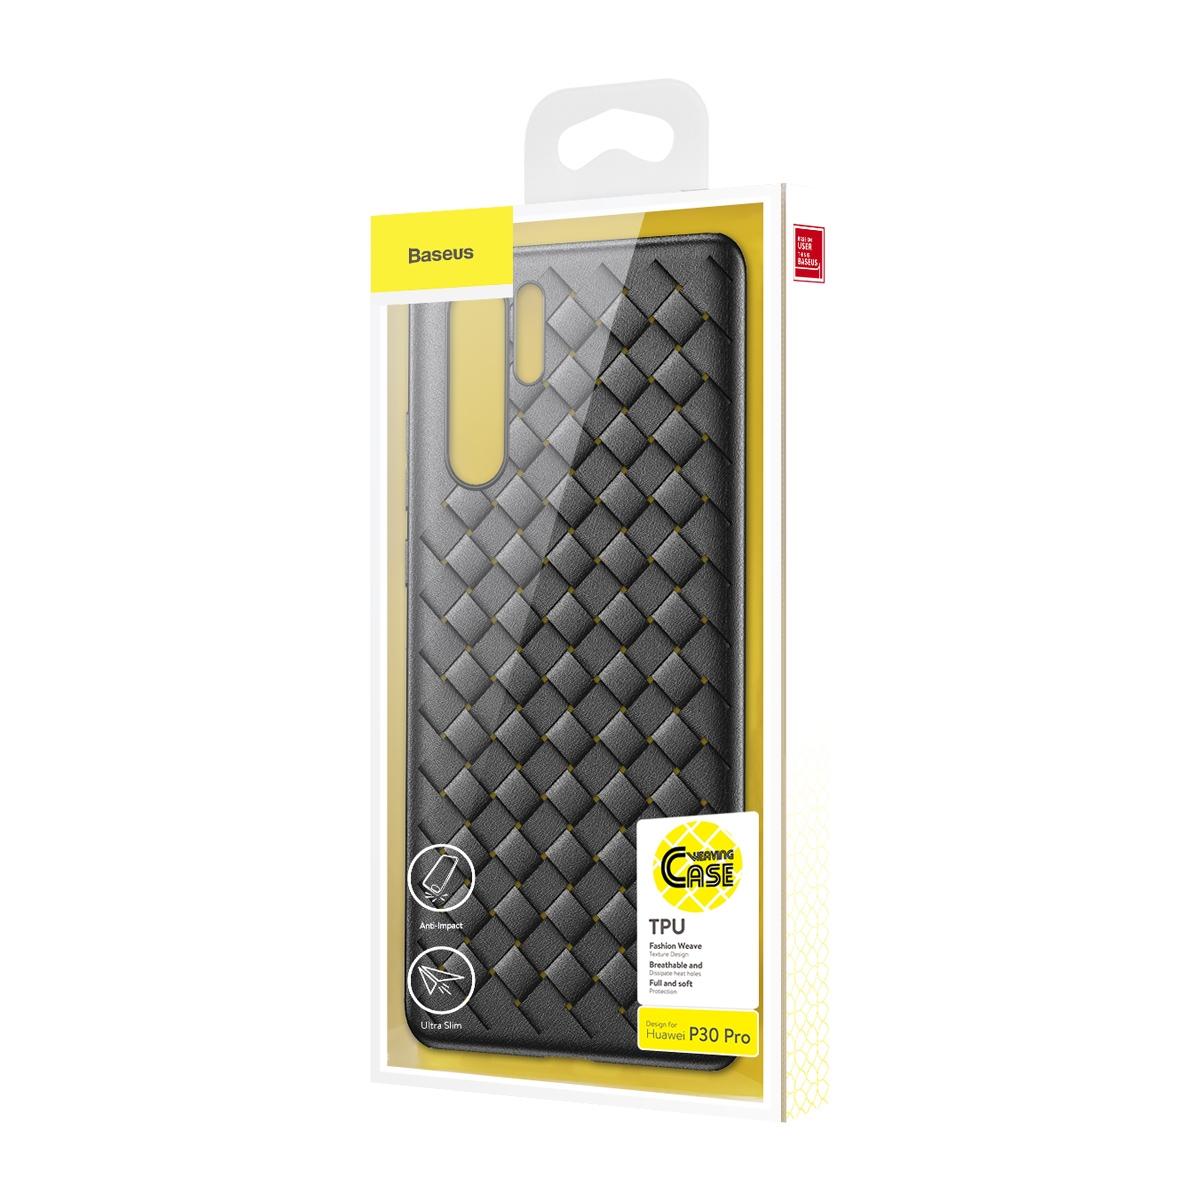 Huawei P30 Pro Baseus BV Weaving Case WIHWP30P-BV01Black